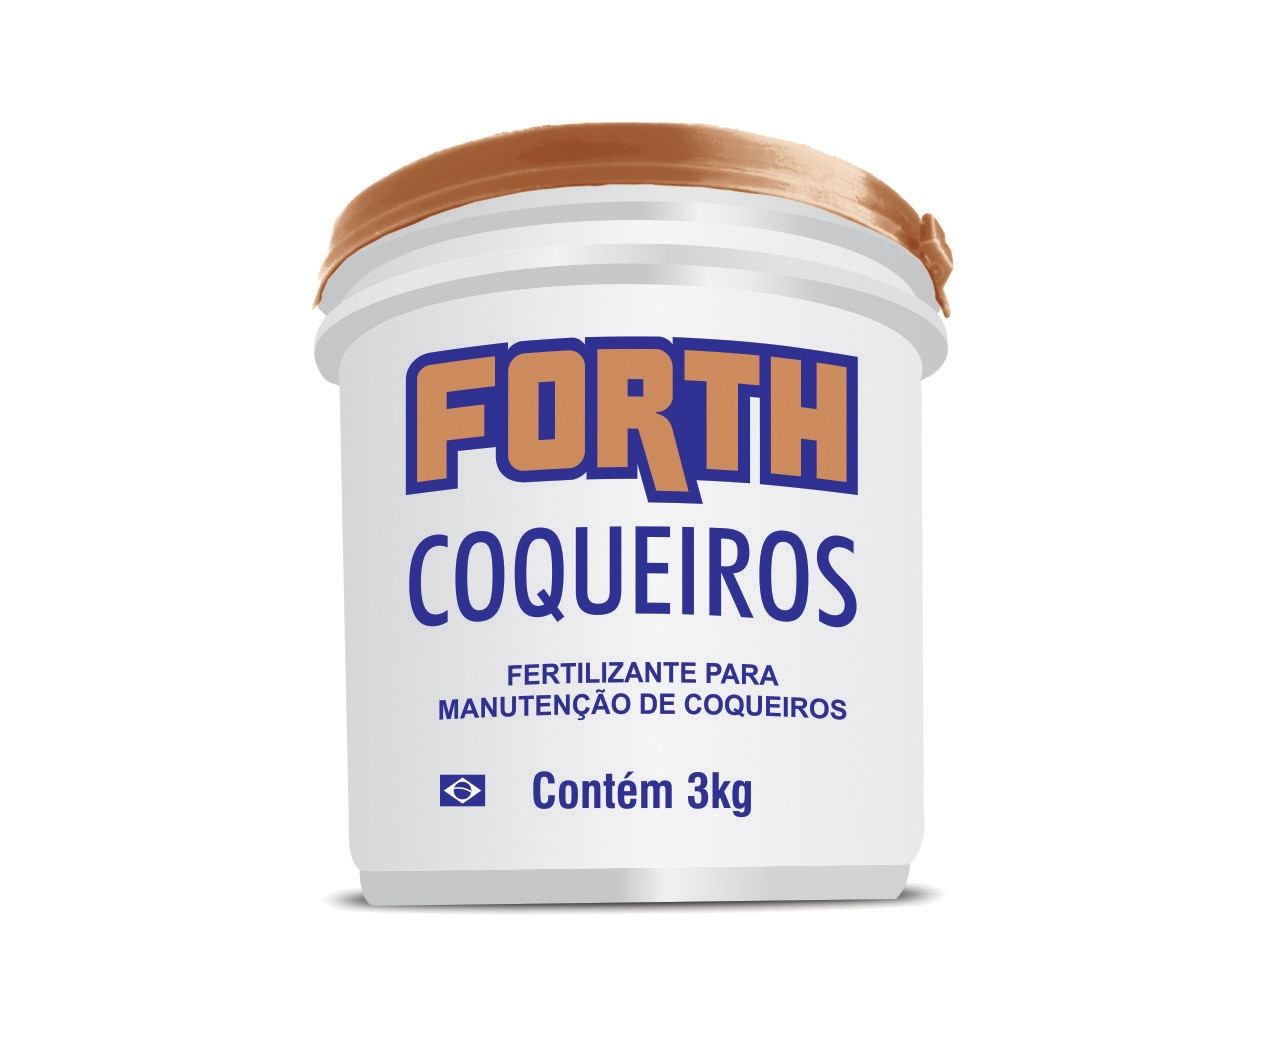 Fertilizante FORTH Coqueiros 3kg